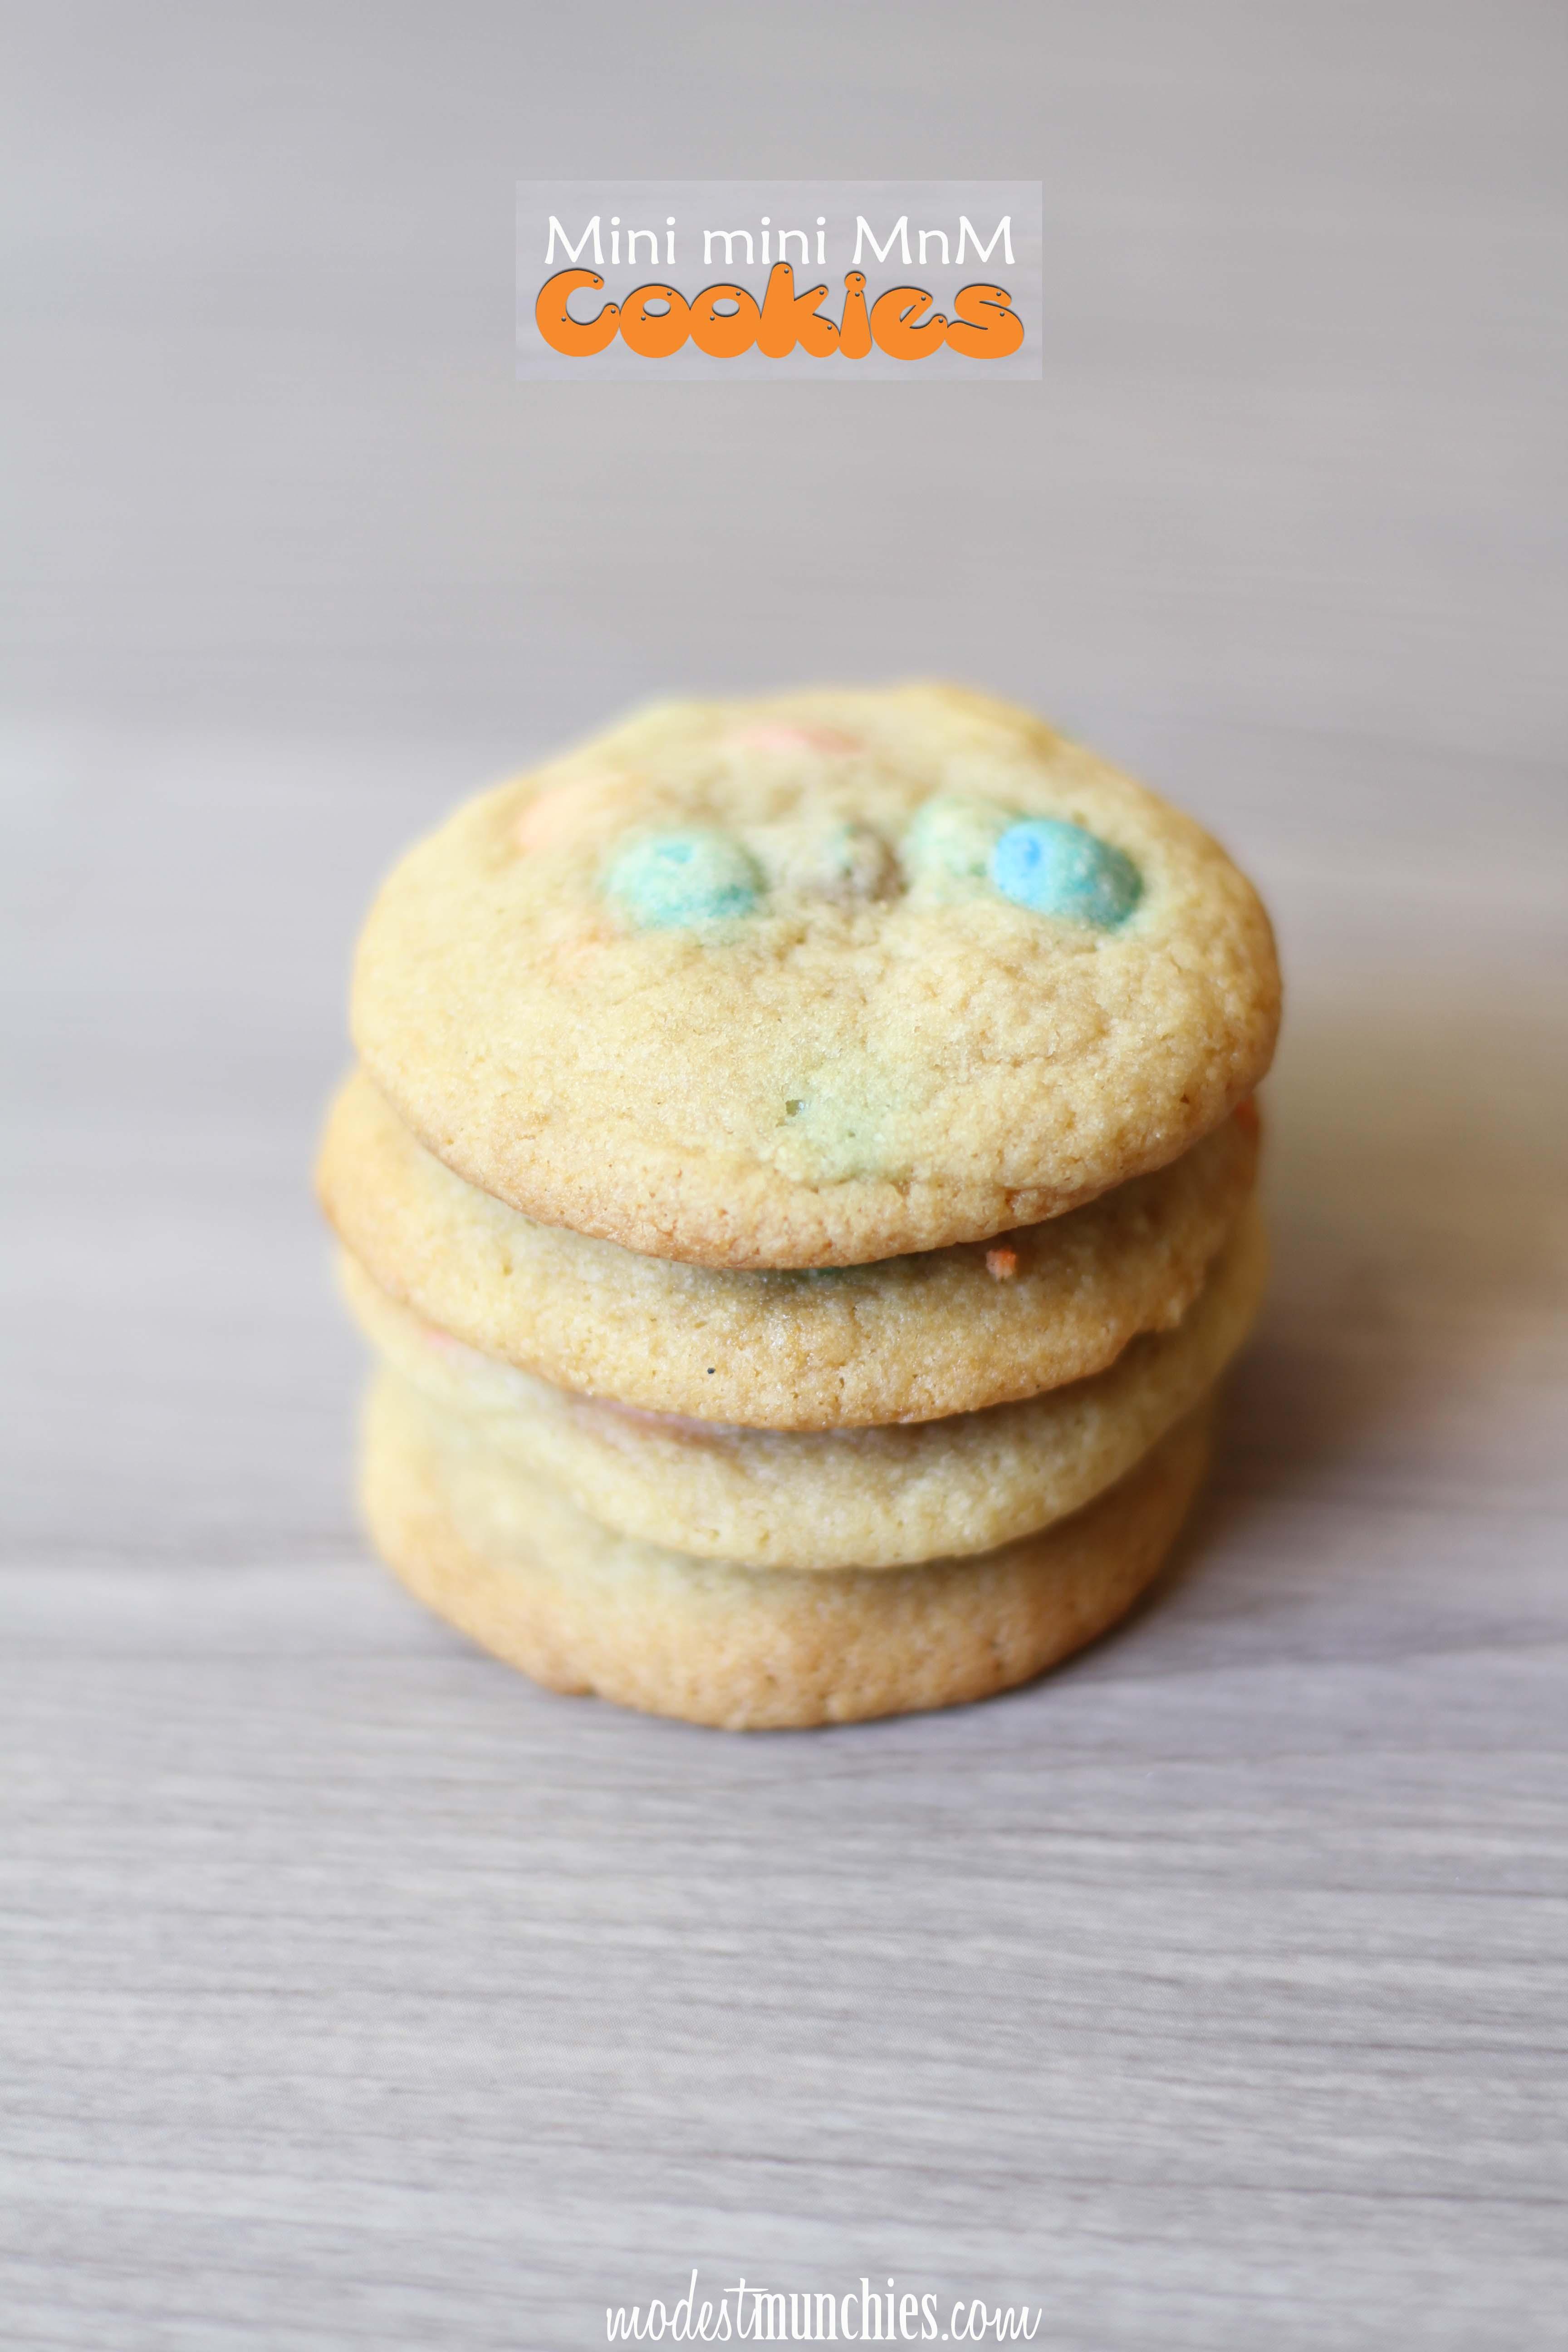 Mini MnM cookies